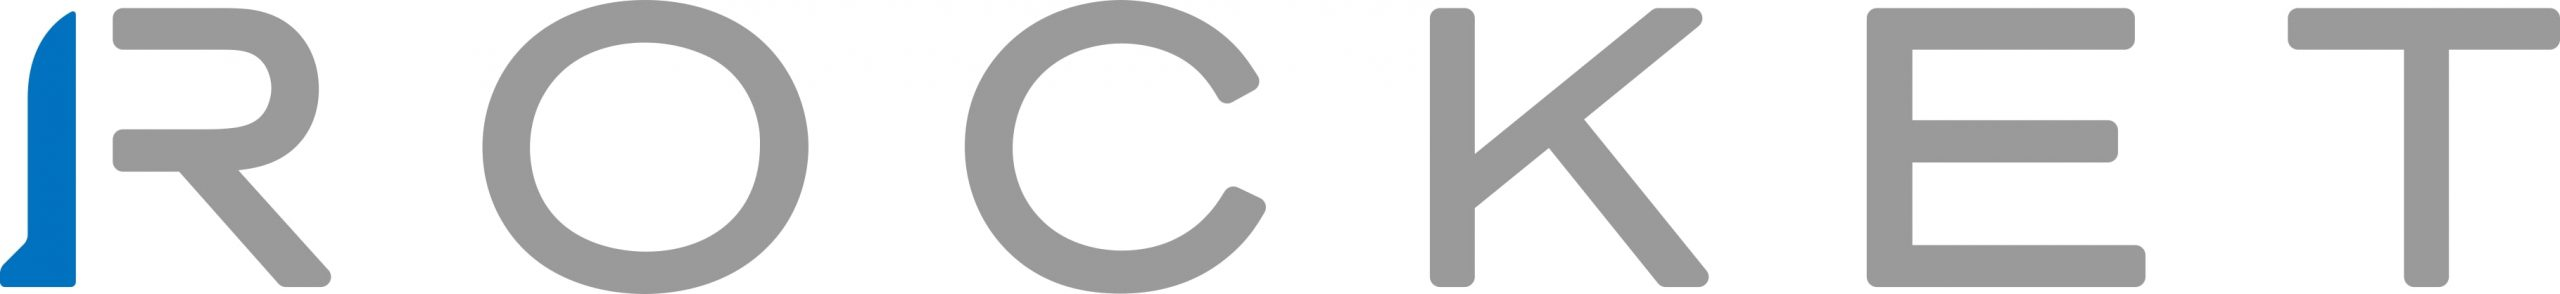 LogoRocket